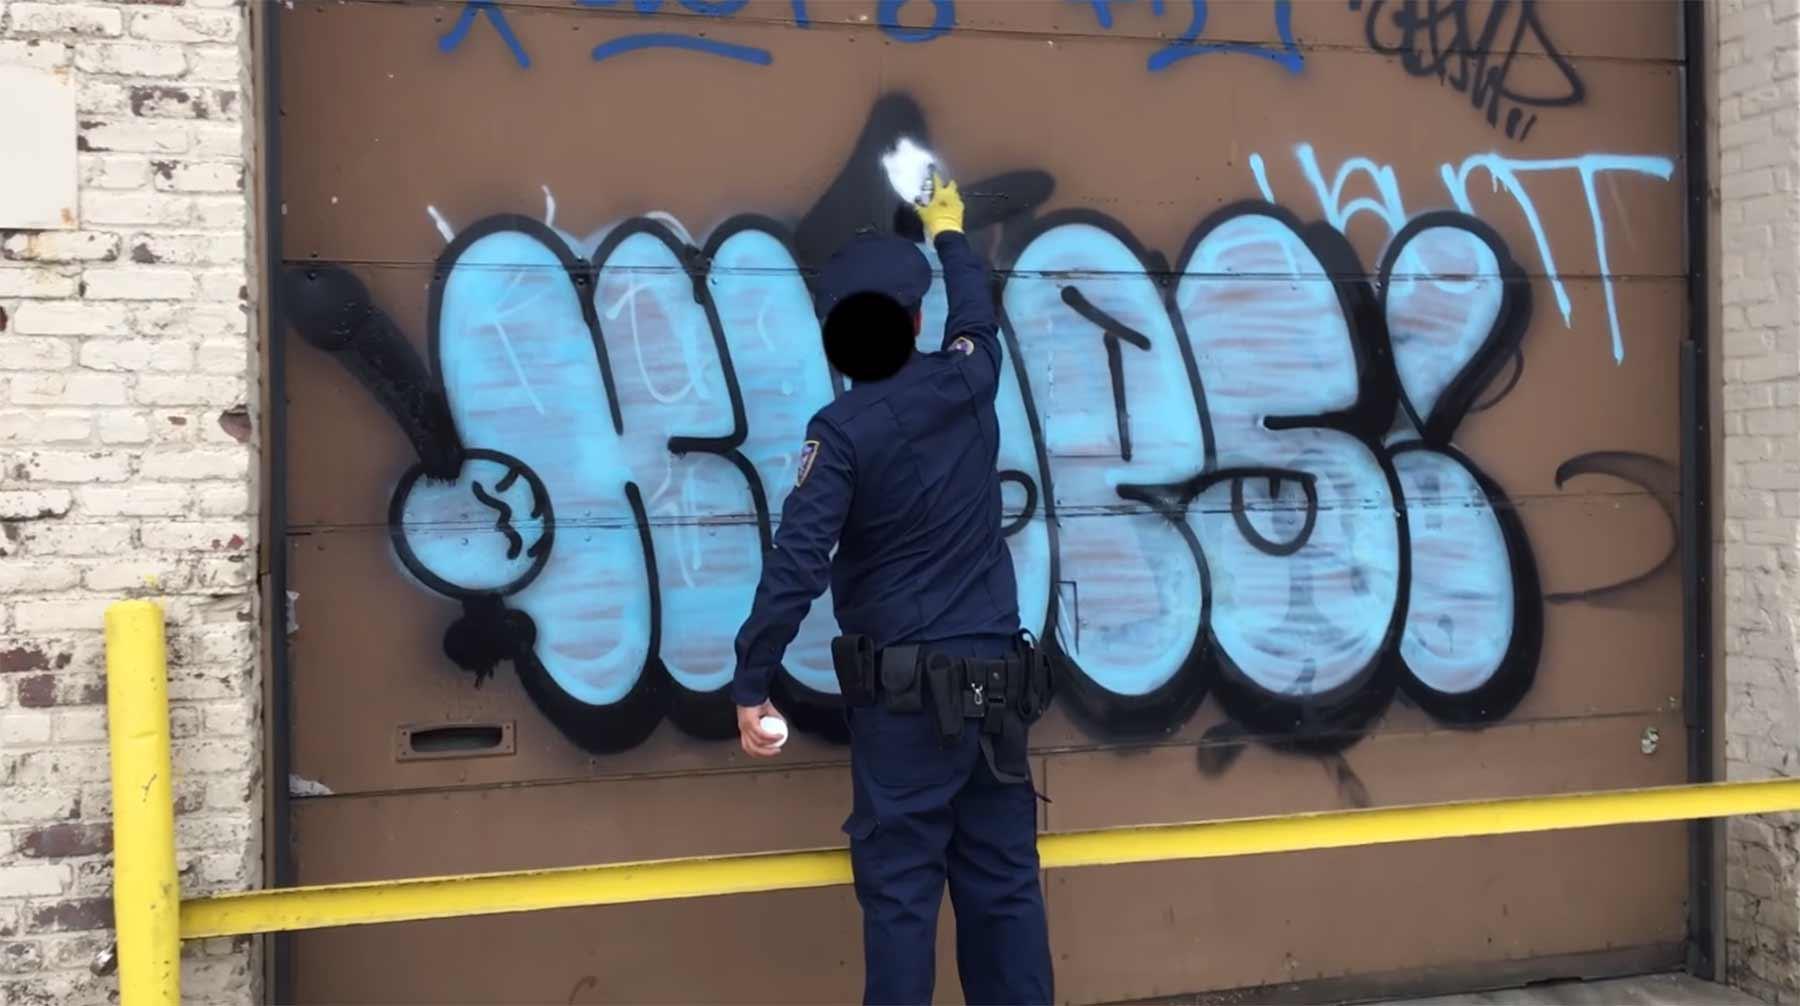 Polizist und Tagger in Personalunion graffit-cop-klops